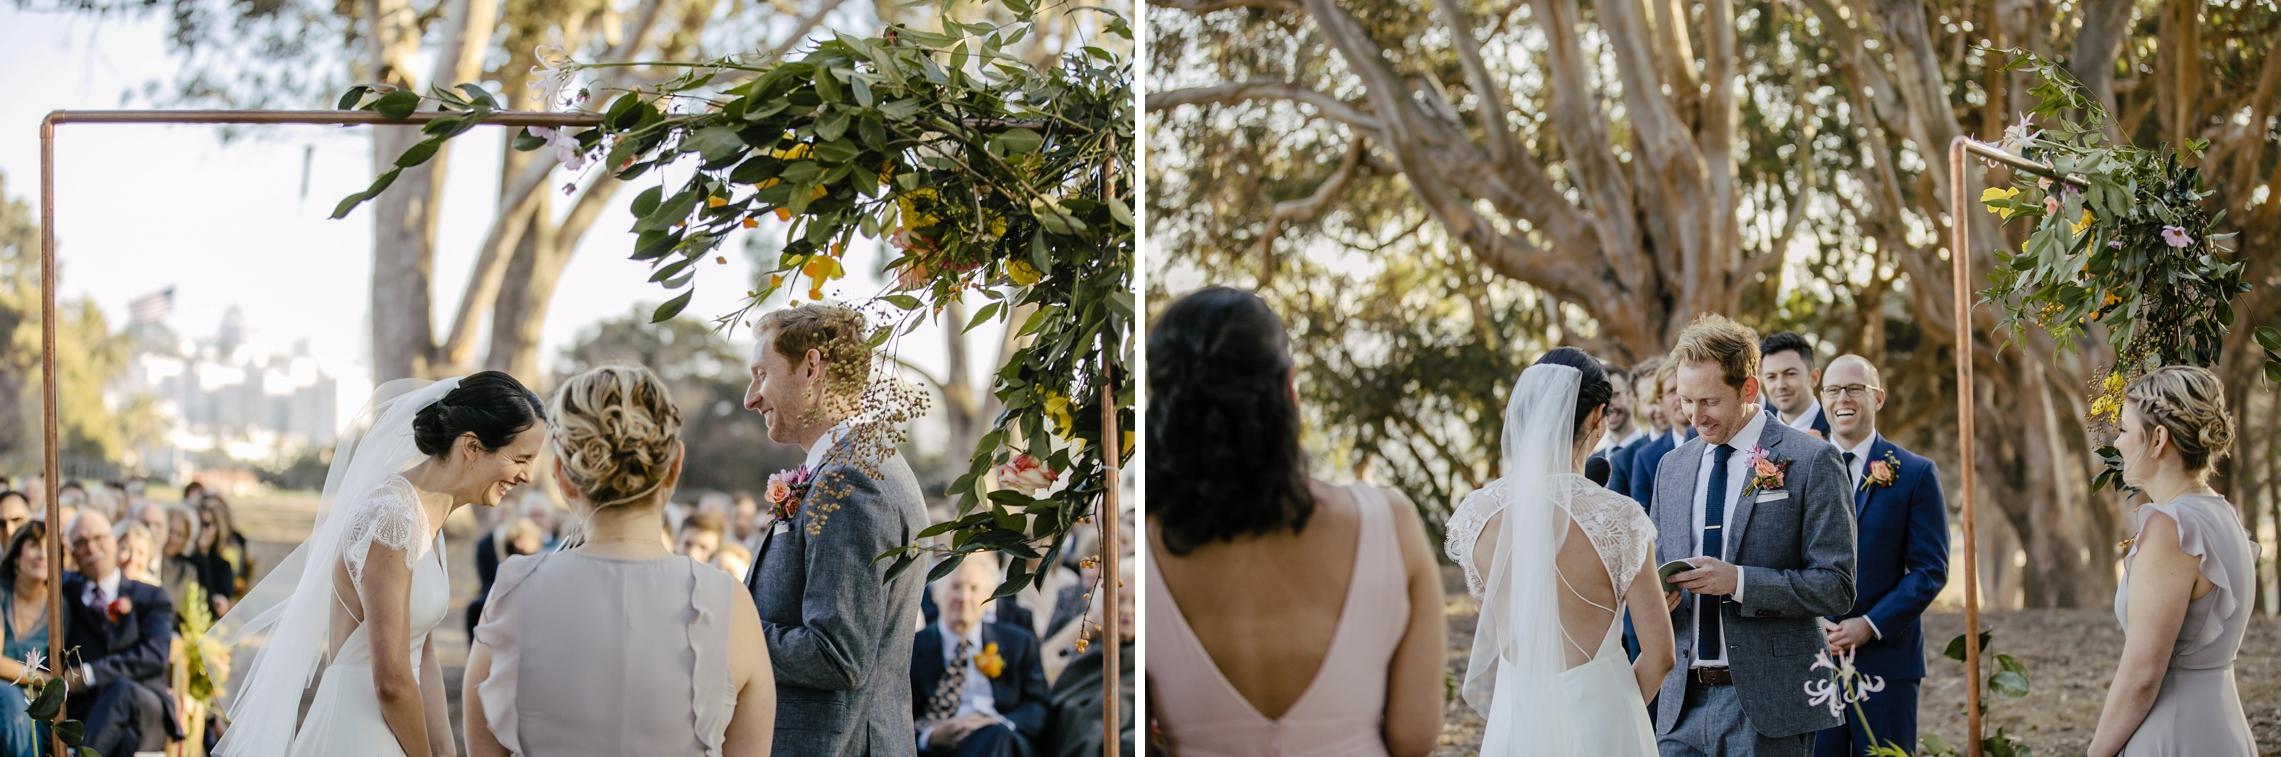 fort-mason-gallery-308-wedding_0042.jpg